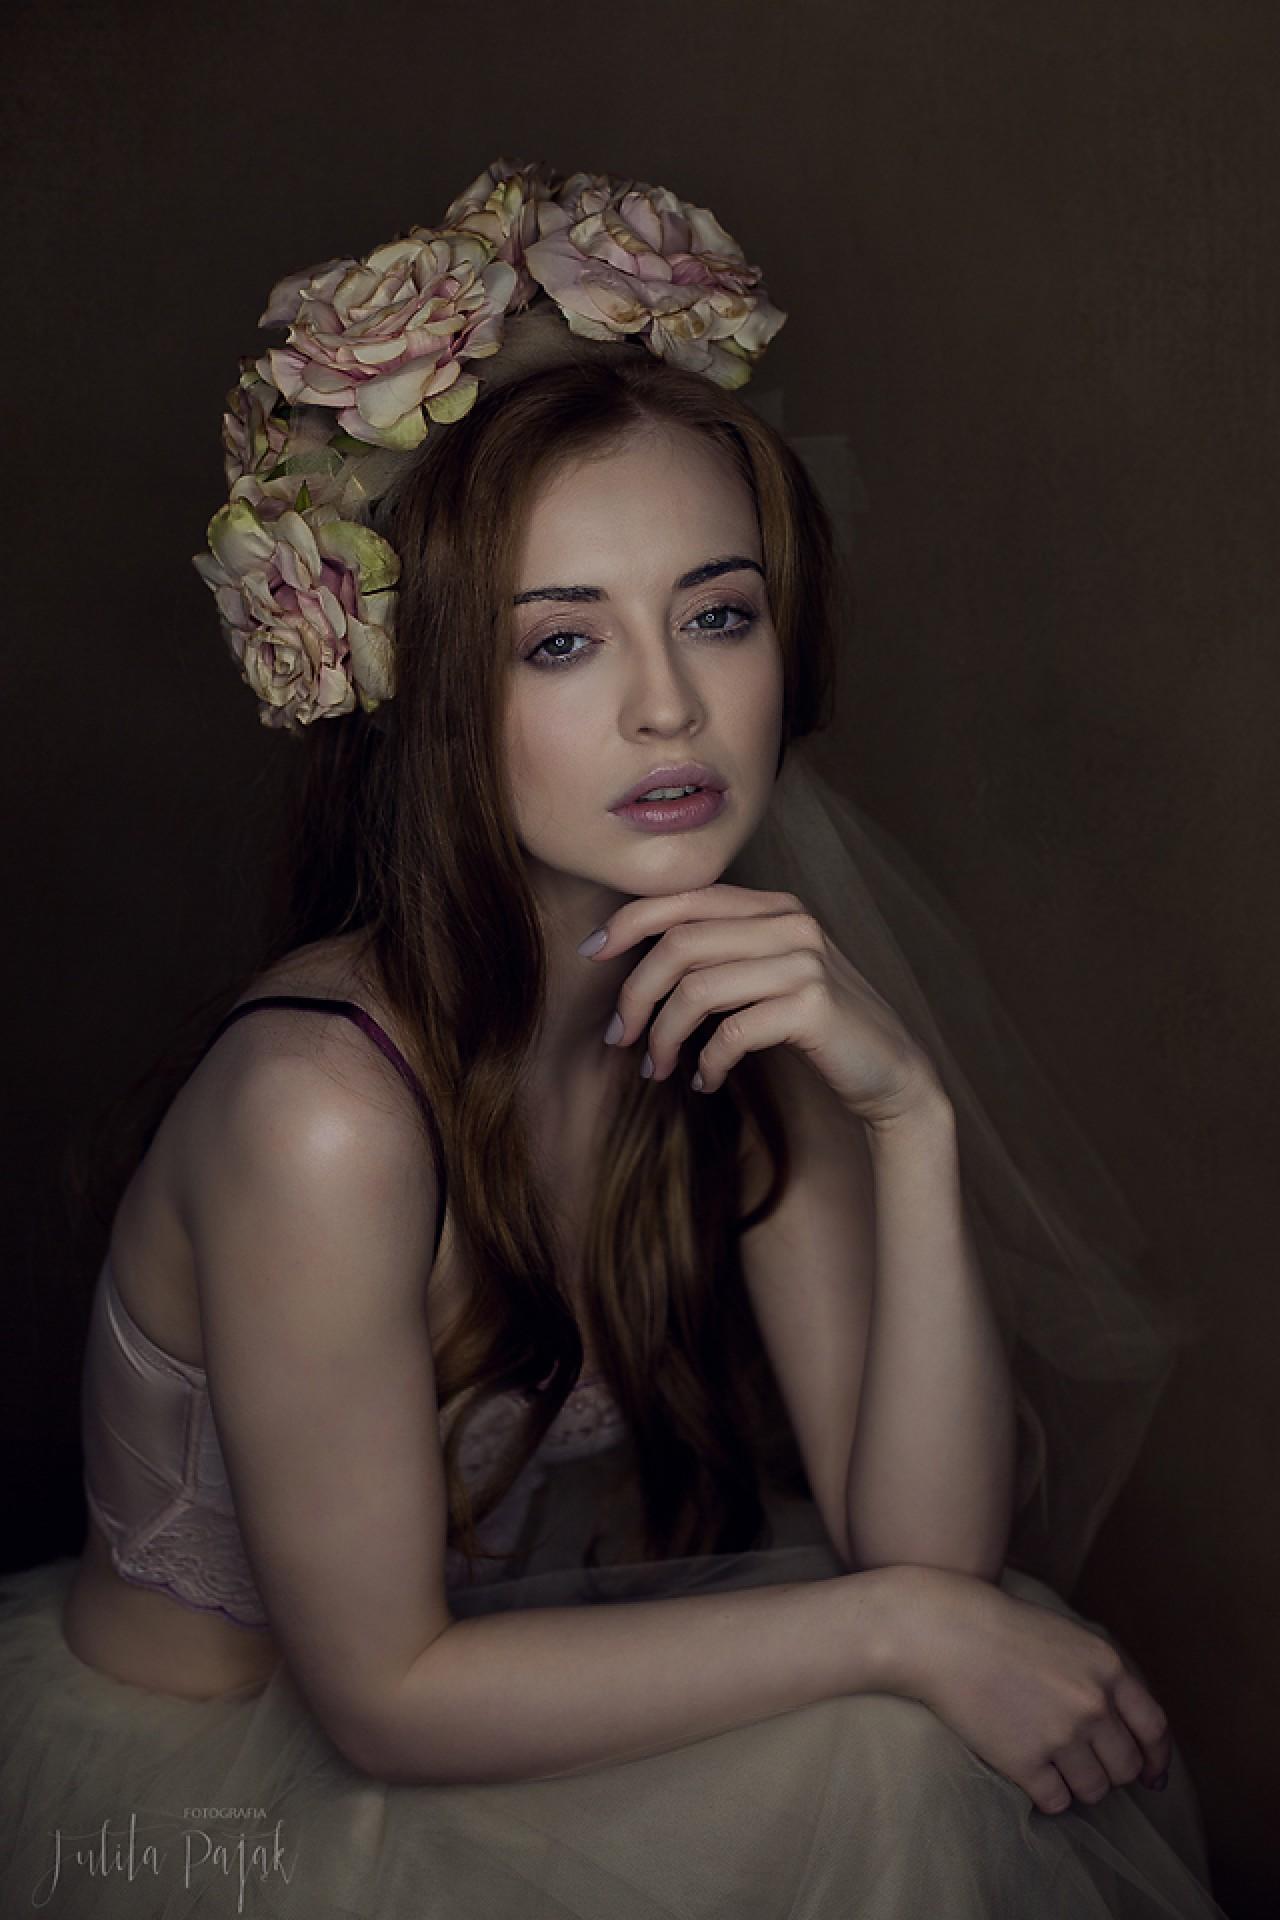 Julita Pająk